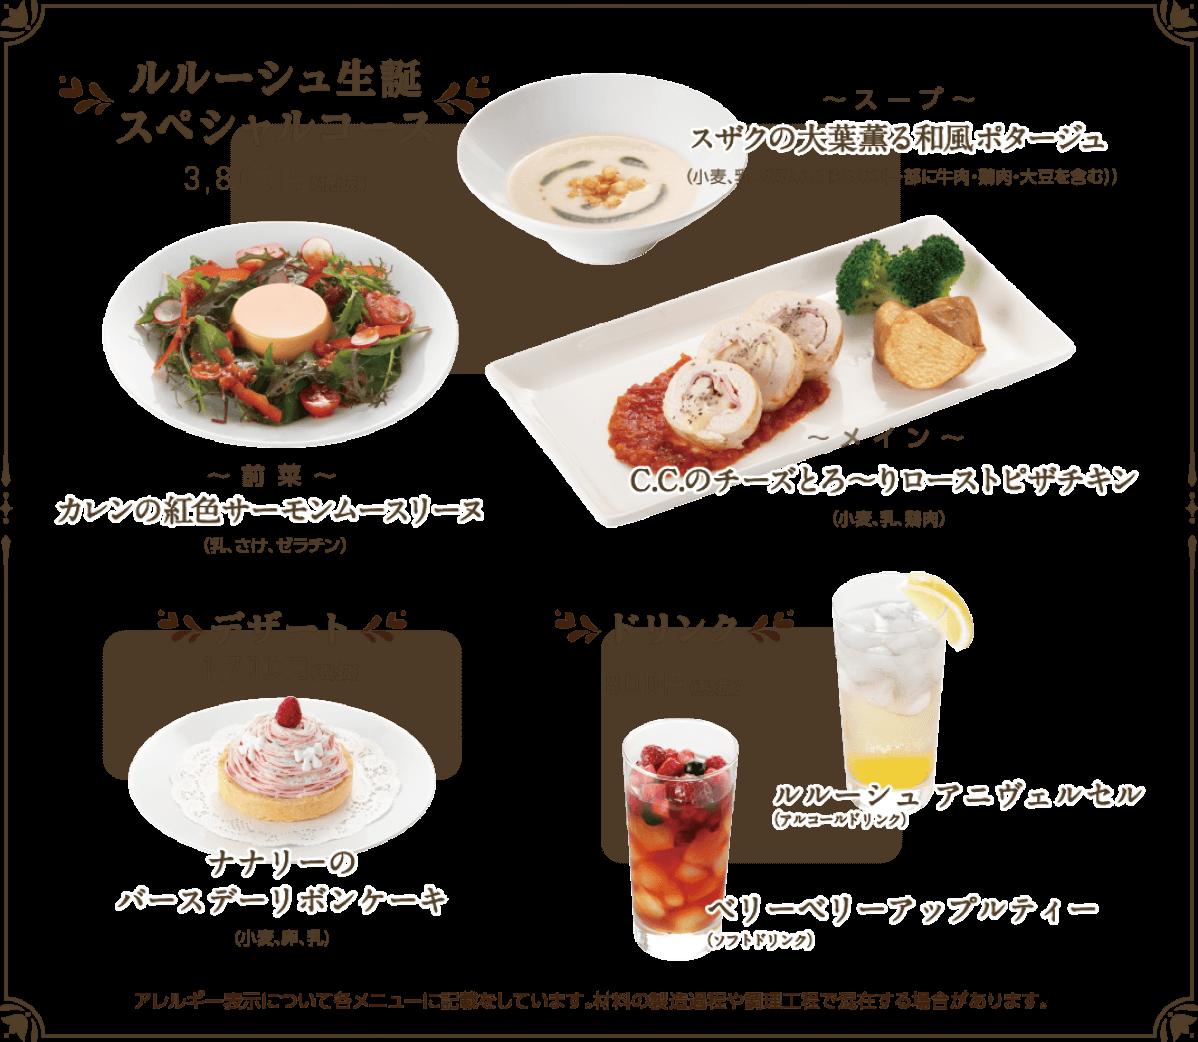 Codegeass menu